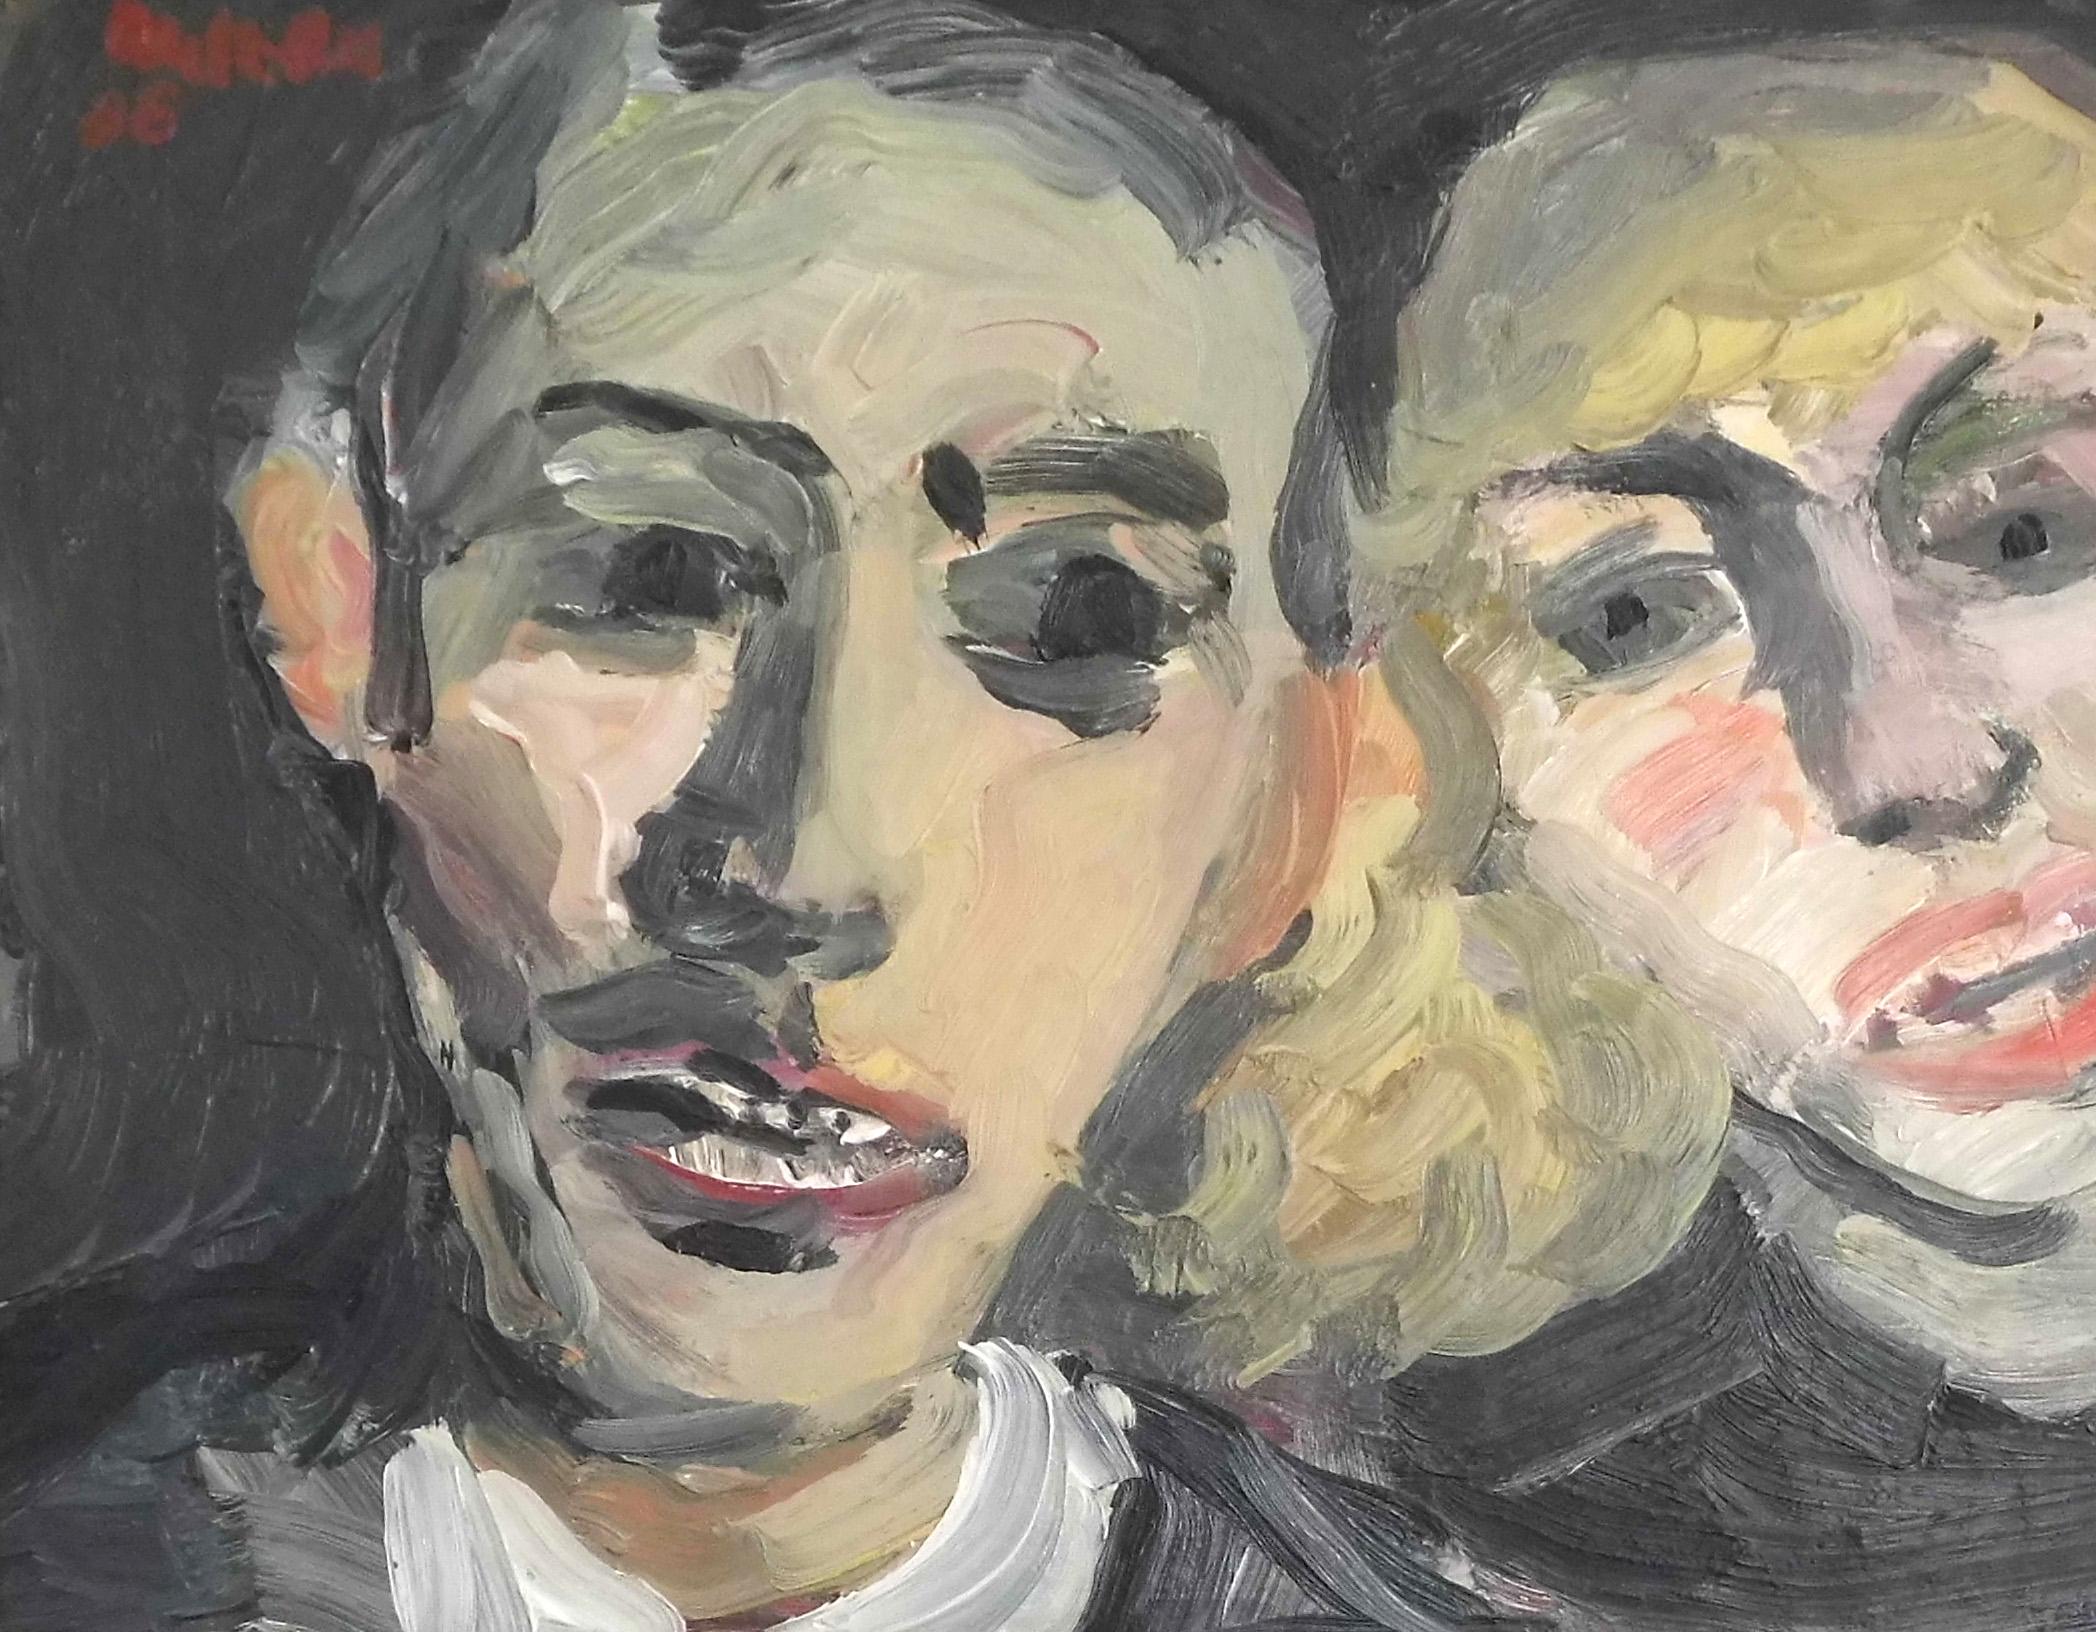 02-harald_metzkes-zwei_gesichter-1986-oel_auf_leinwand-24x30